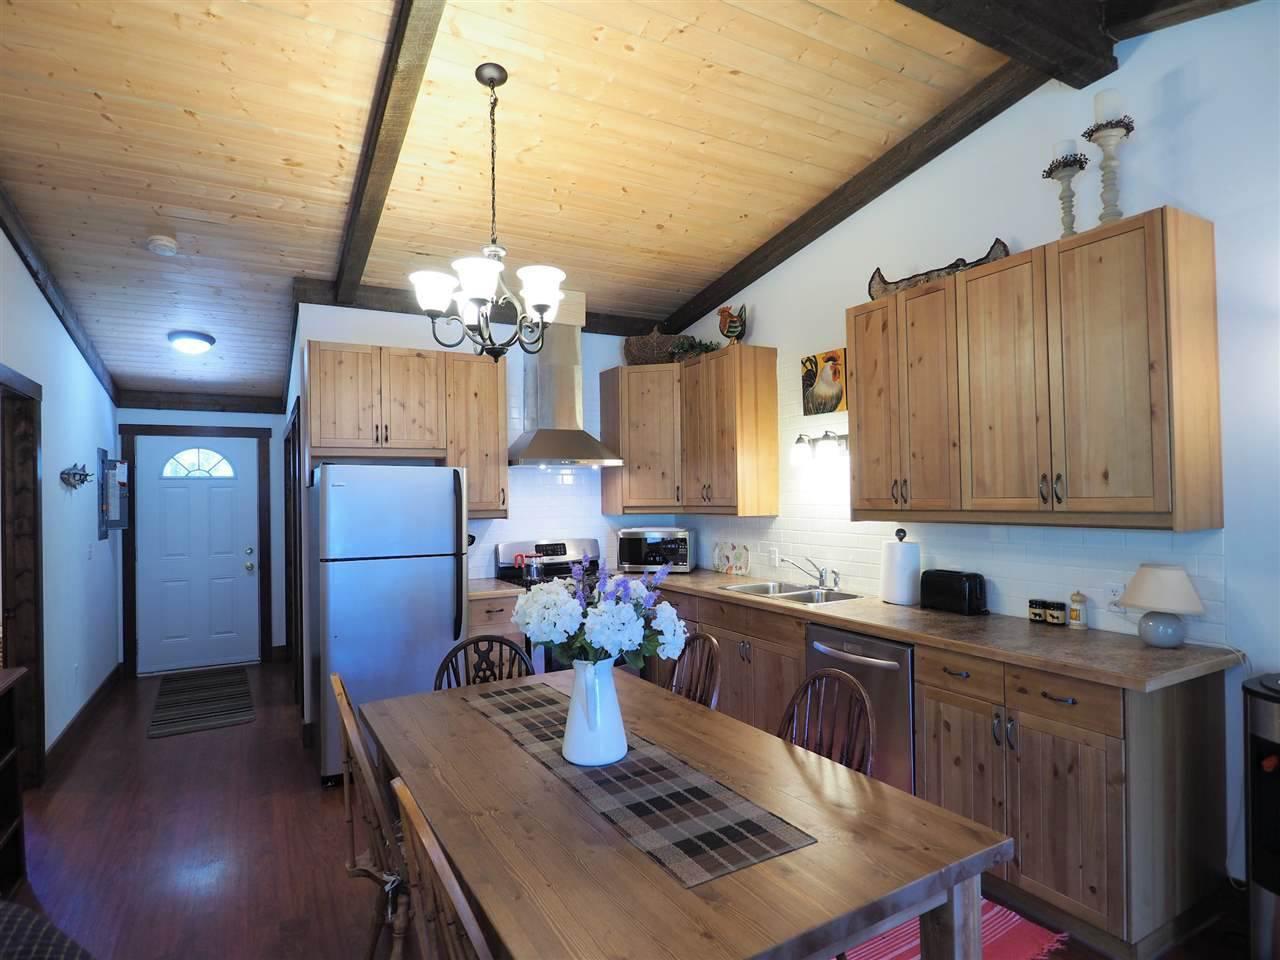 Photo 13: Photos: 8222 CENTENNIAL Road in Bridge Lake: Bridge Lake/Sheridan Lake House for sale (100 Mile House (Zone 10))  : MLS®# R2457362